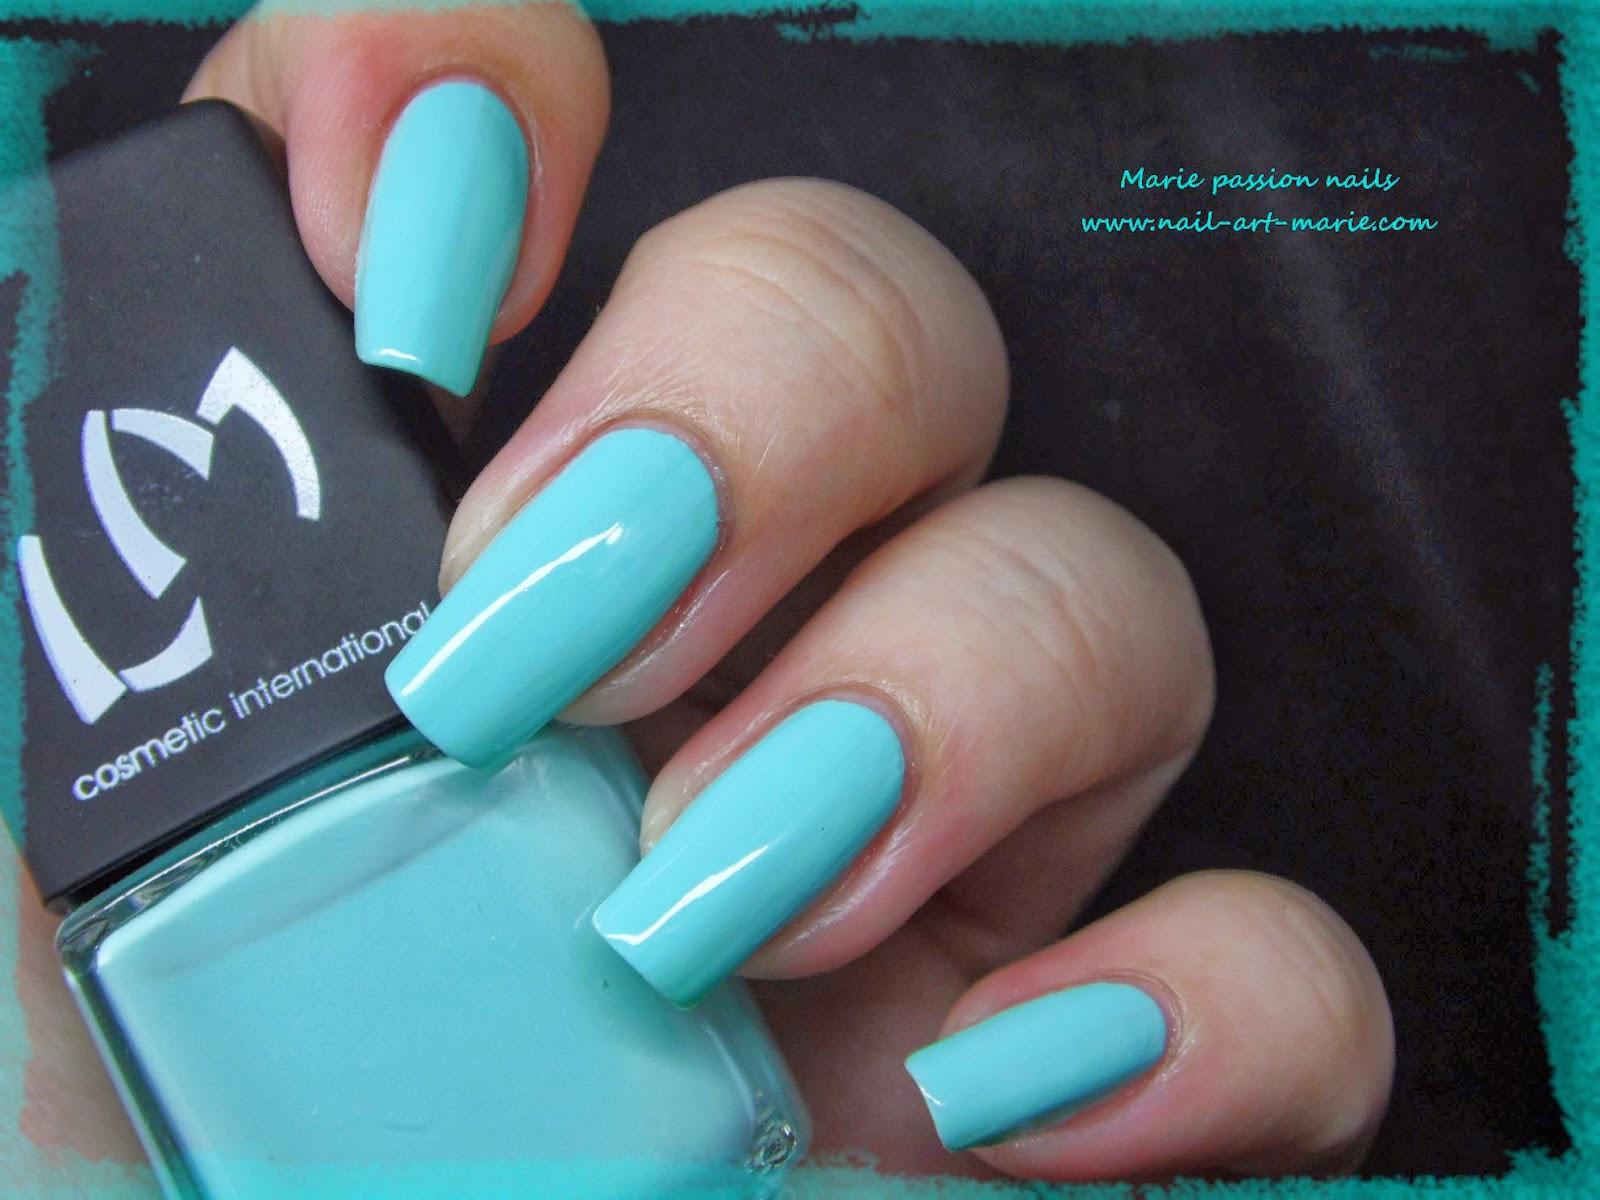 LM Cosmetic Mintcream8